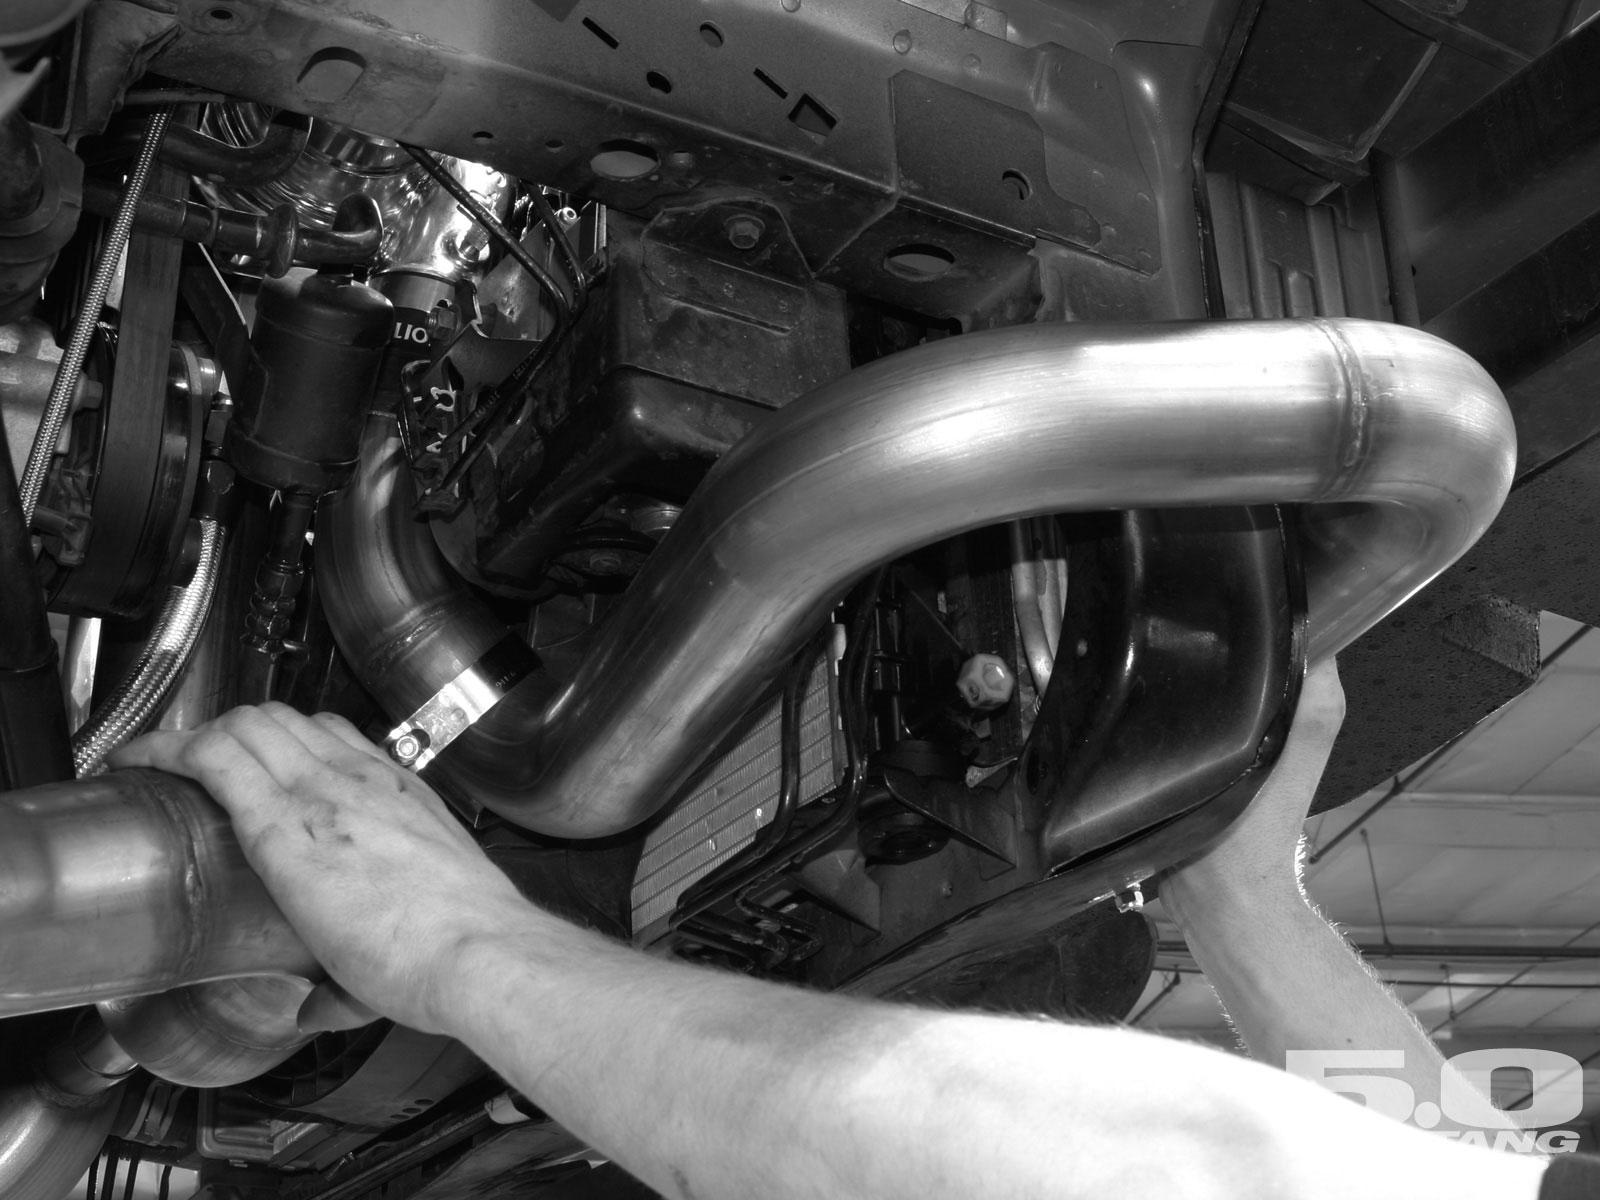 M5lp 0507 26 O+hellion Power Systems Mod Motor Turbo Kit+intercooler